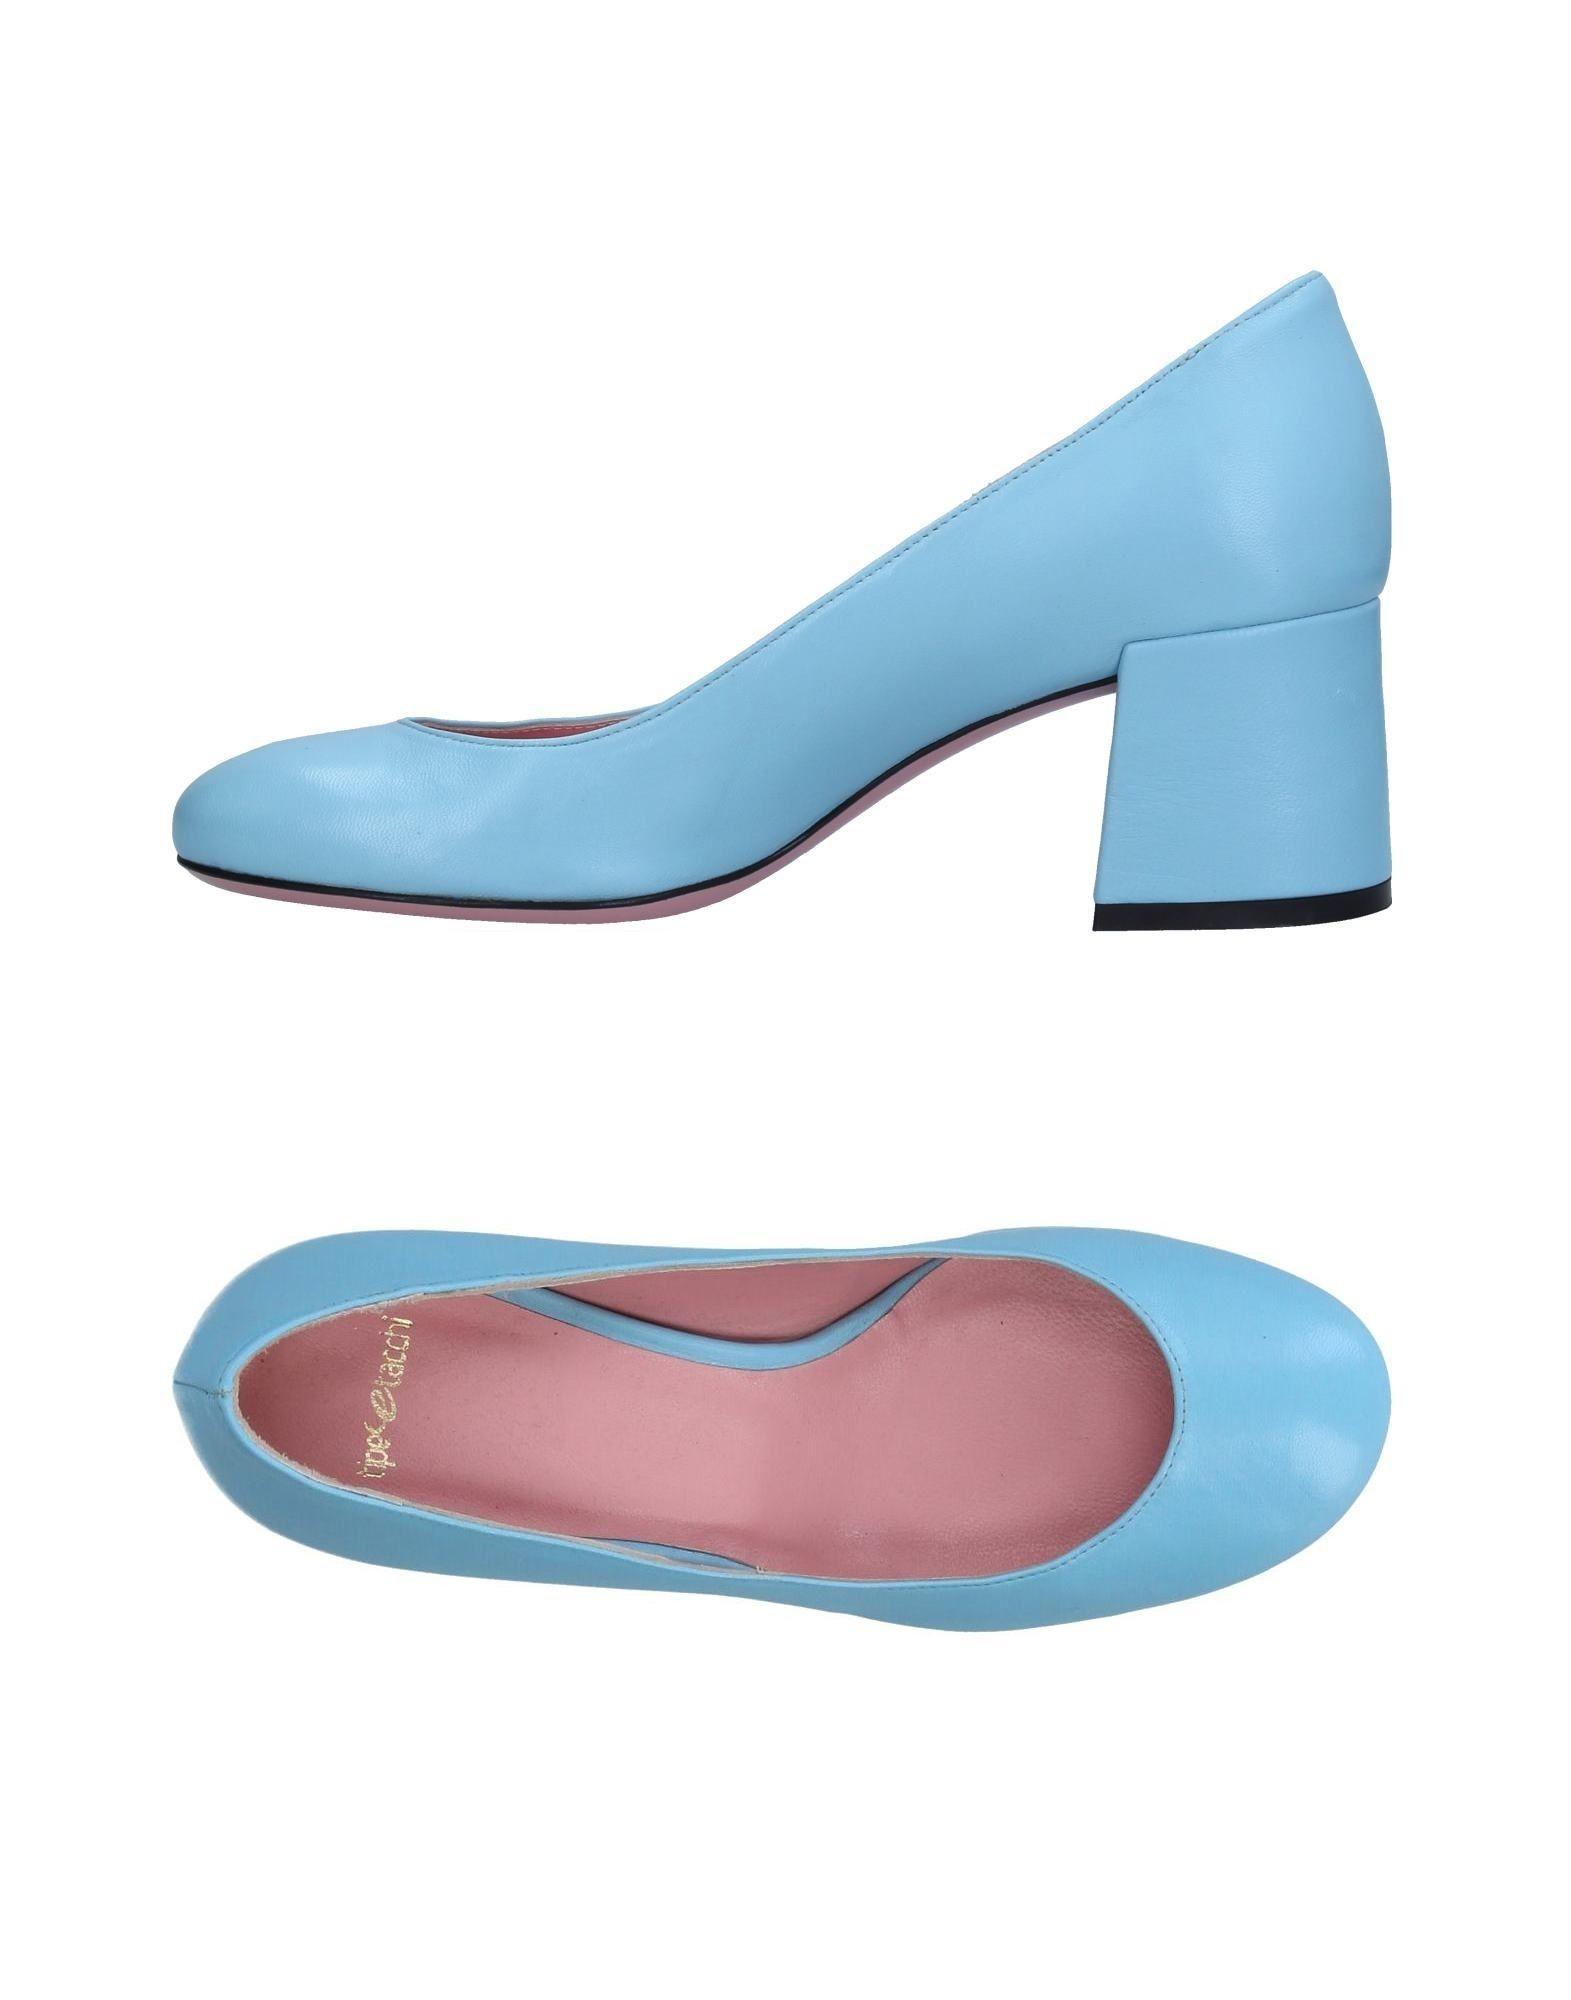 TIPE E TACCHI Damen Pumps Farbe Himmelblau Größe 9 jetztbilligerkaufen